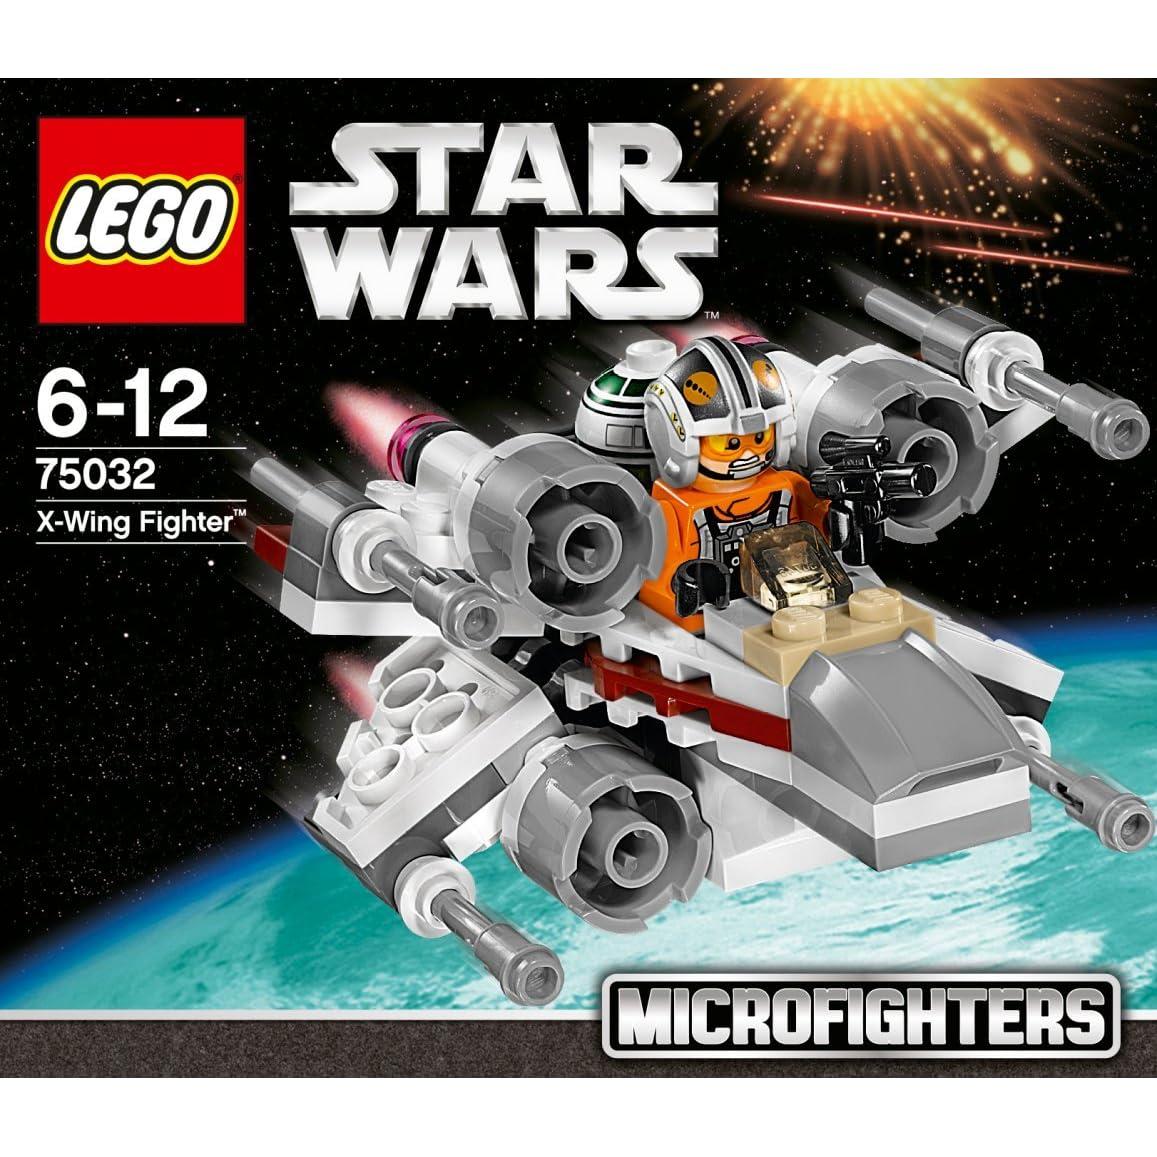 Lego Star Wars X Wing Starfighter 75218 Brand New: New LEGO Star Wars Micro Fighter X-wing Fighter 75032 From